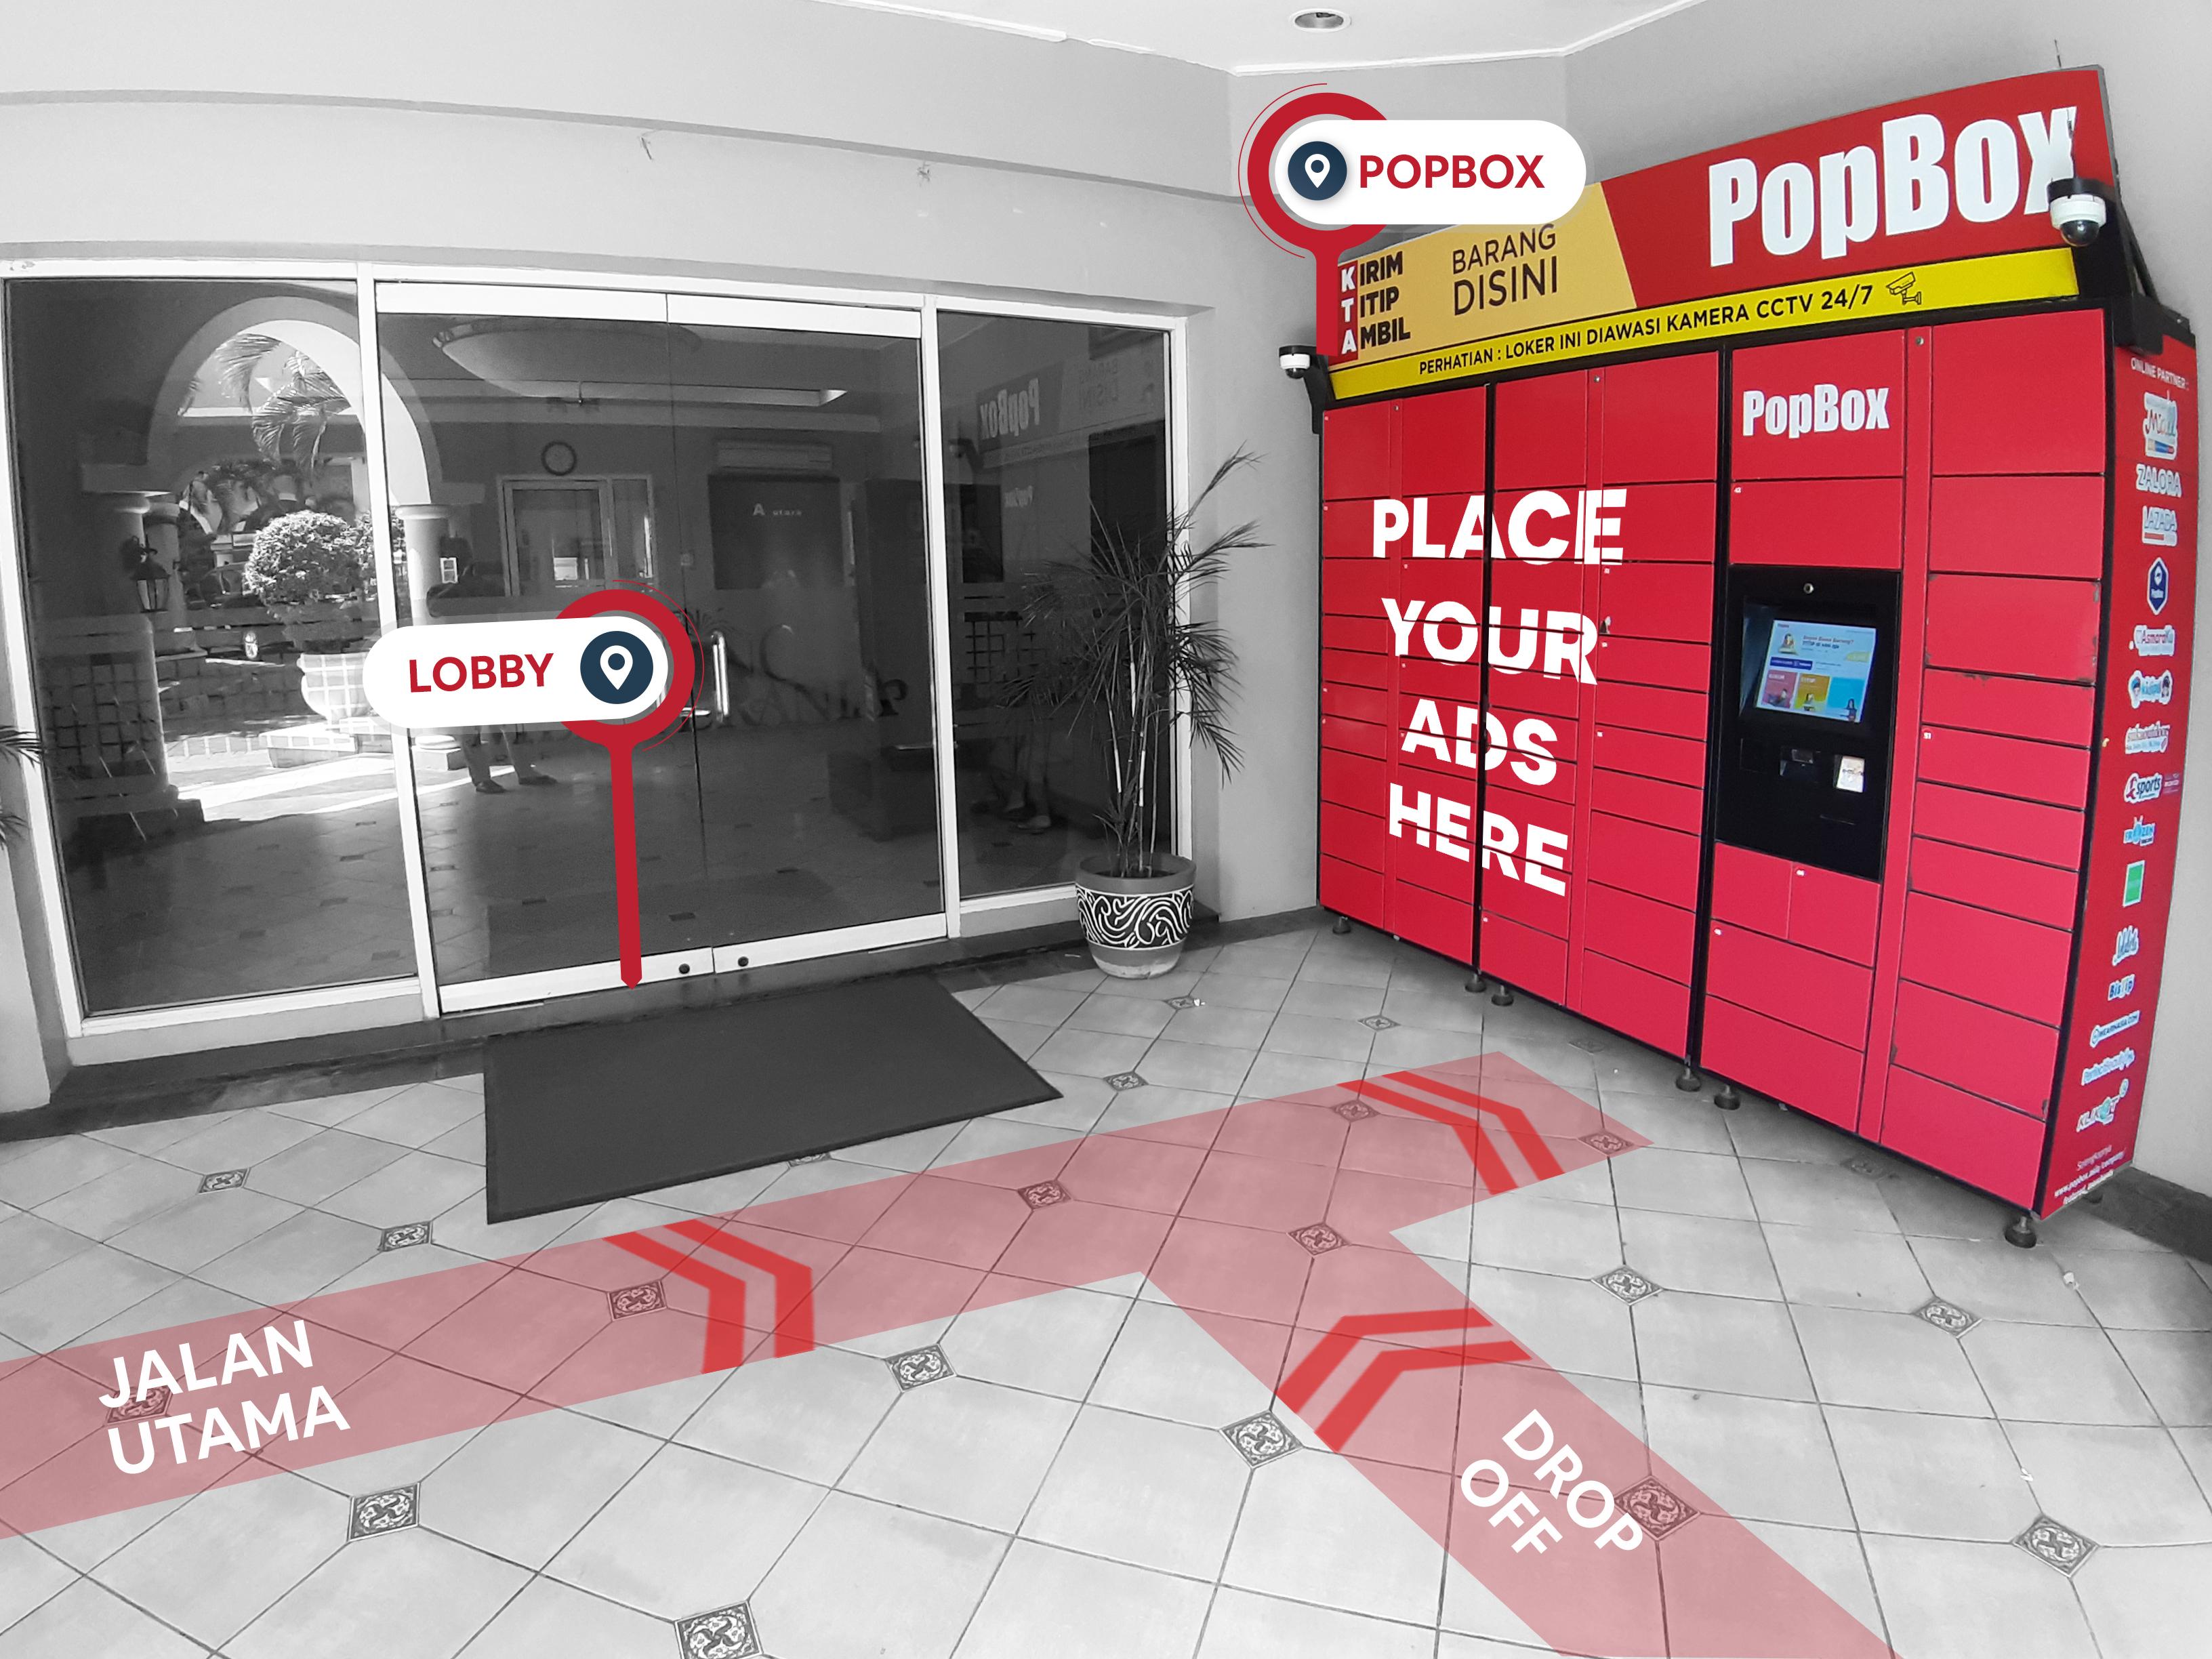 PopBox Locker Advertisement